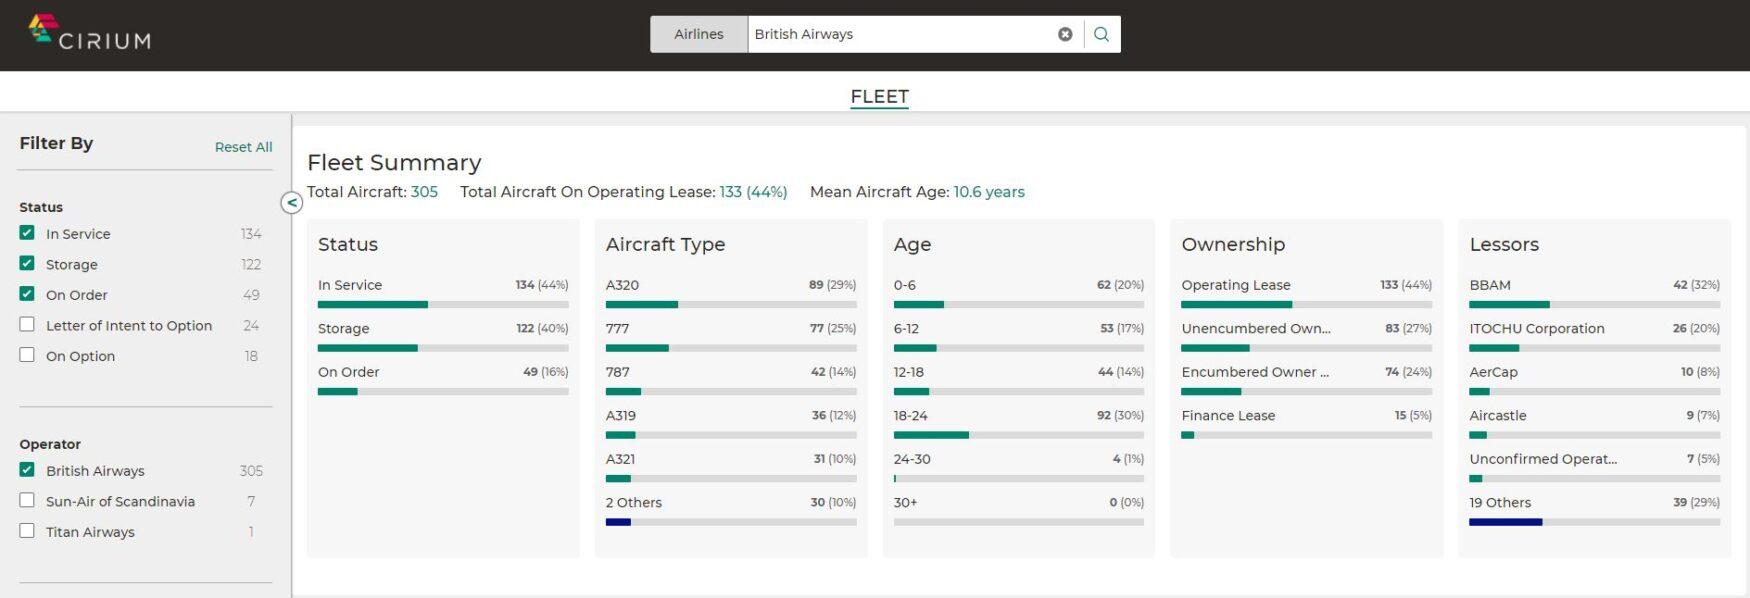 Screenshot of British Airways Fleet in Cirium Profiles